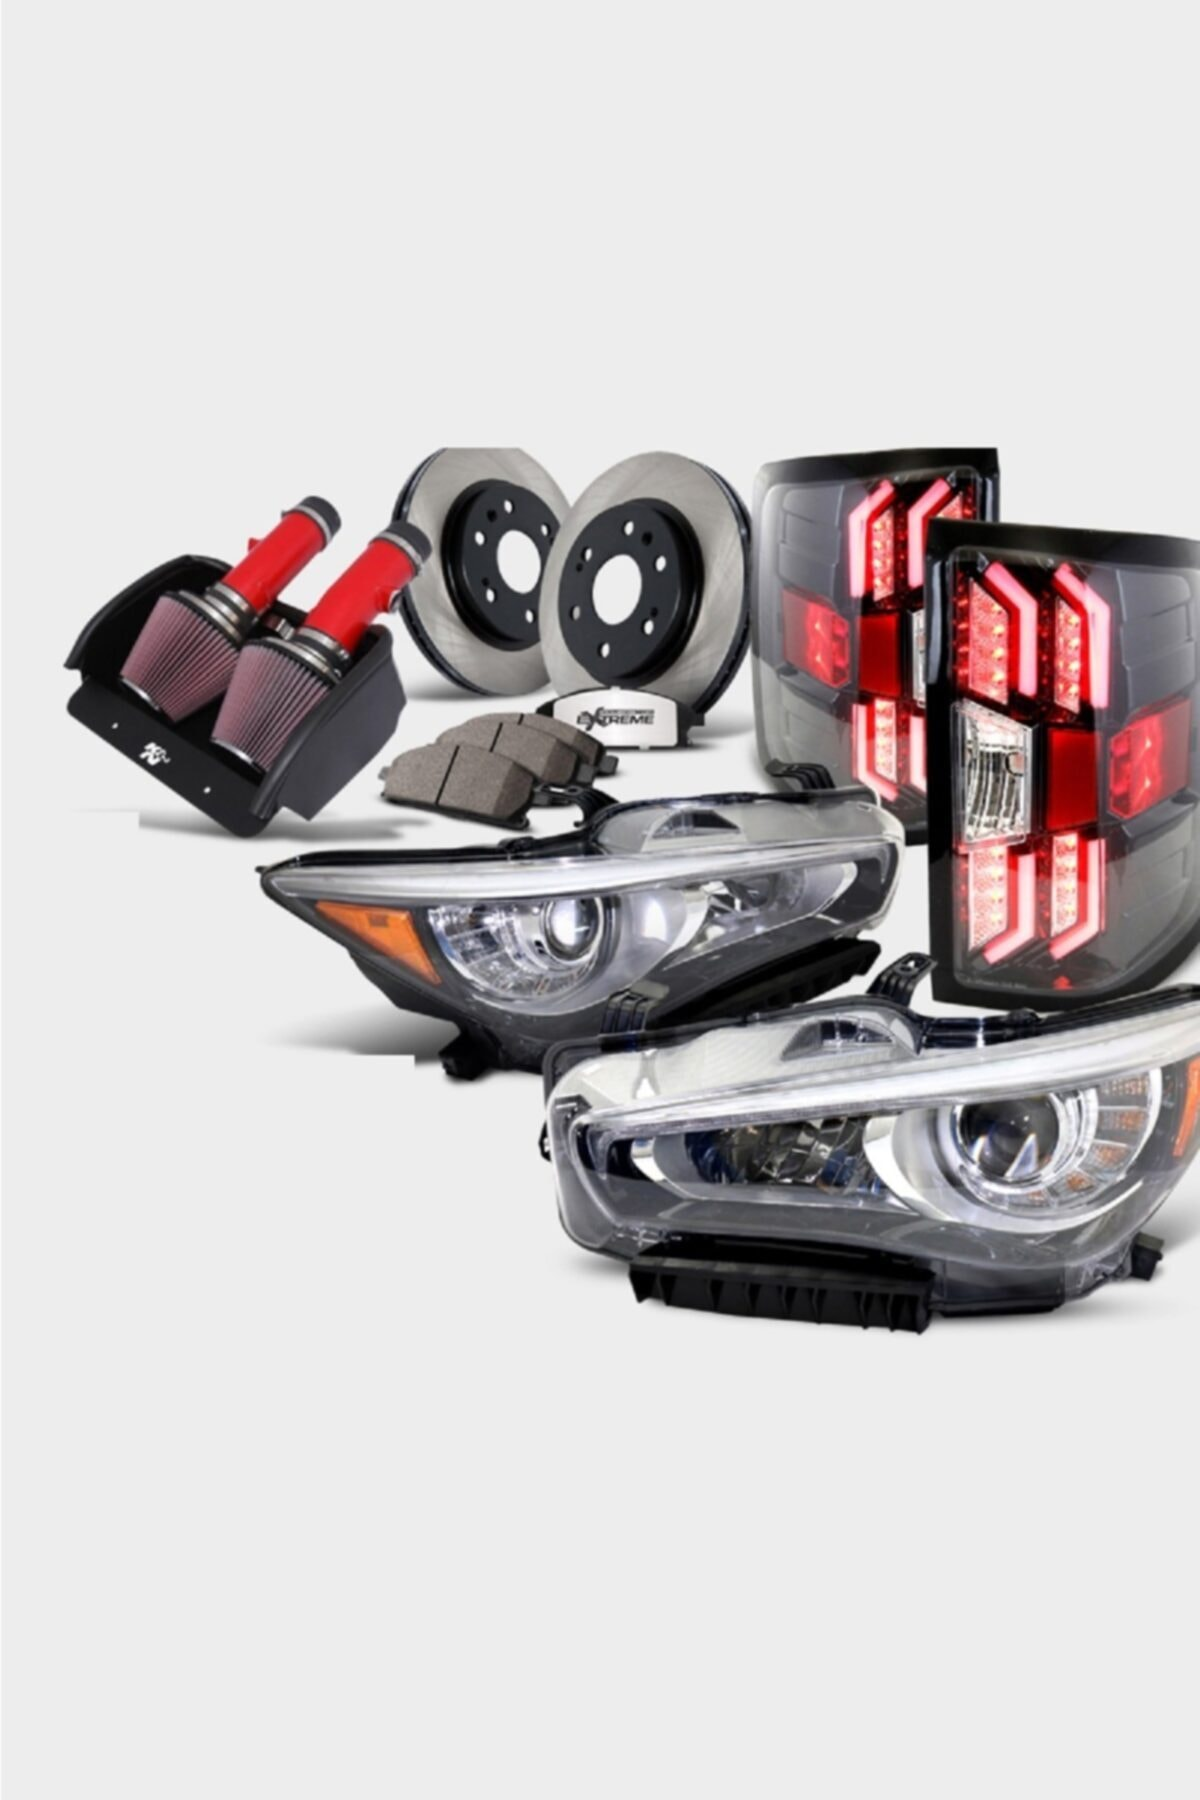 MAHLE Motor Piston Segman 75,00mm Std P106-p206 Tu3a-114w7, 0118l4, 9561968180, 2